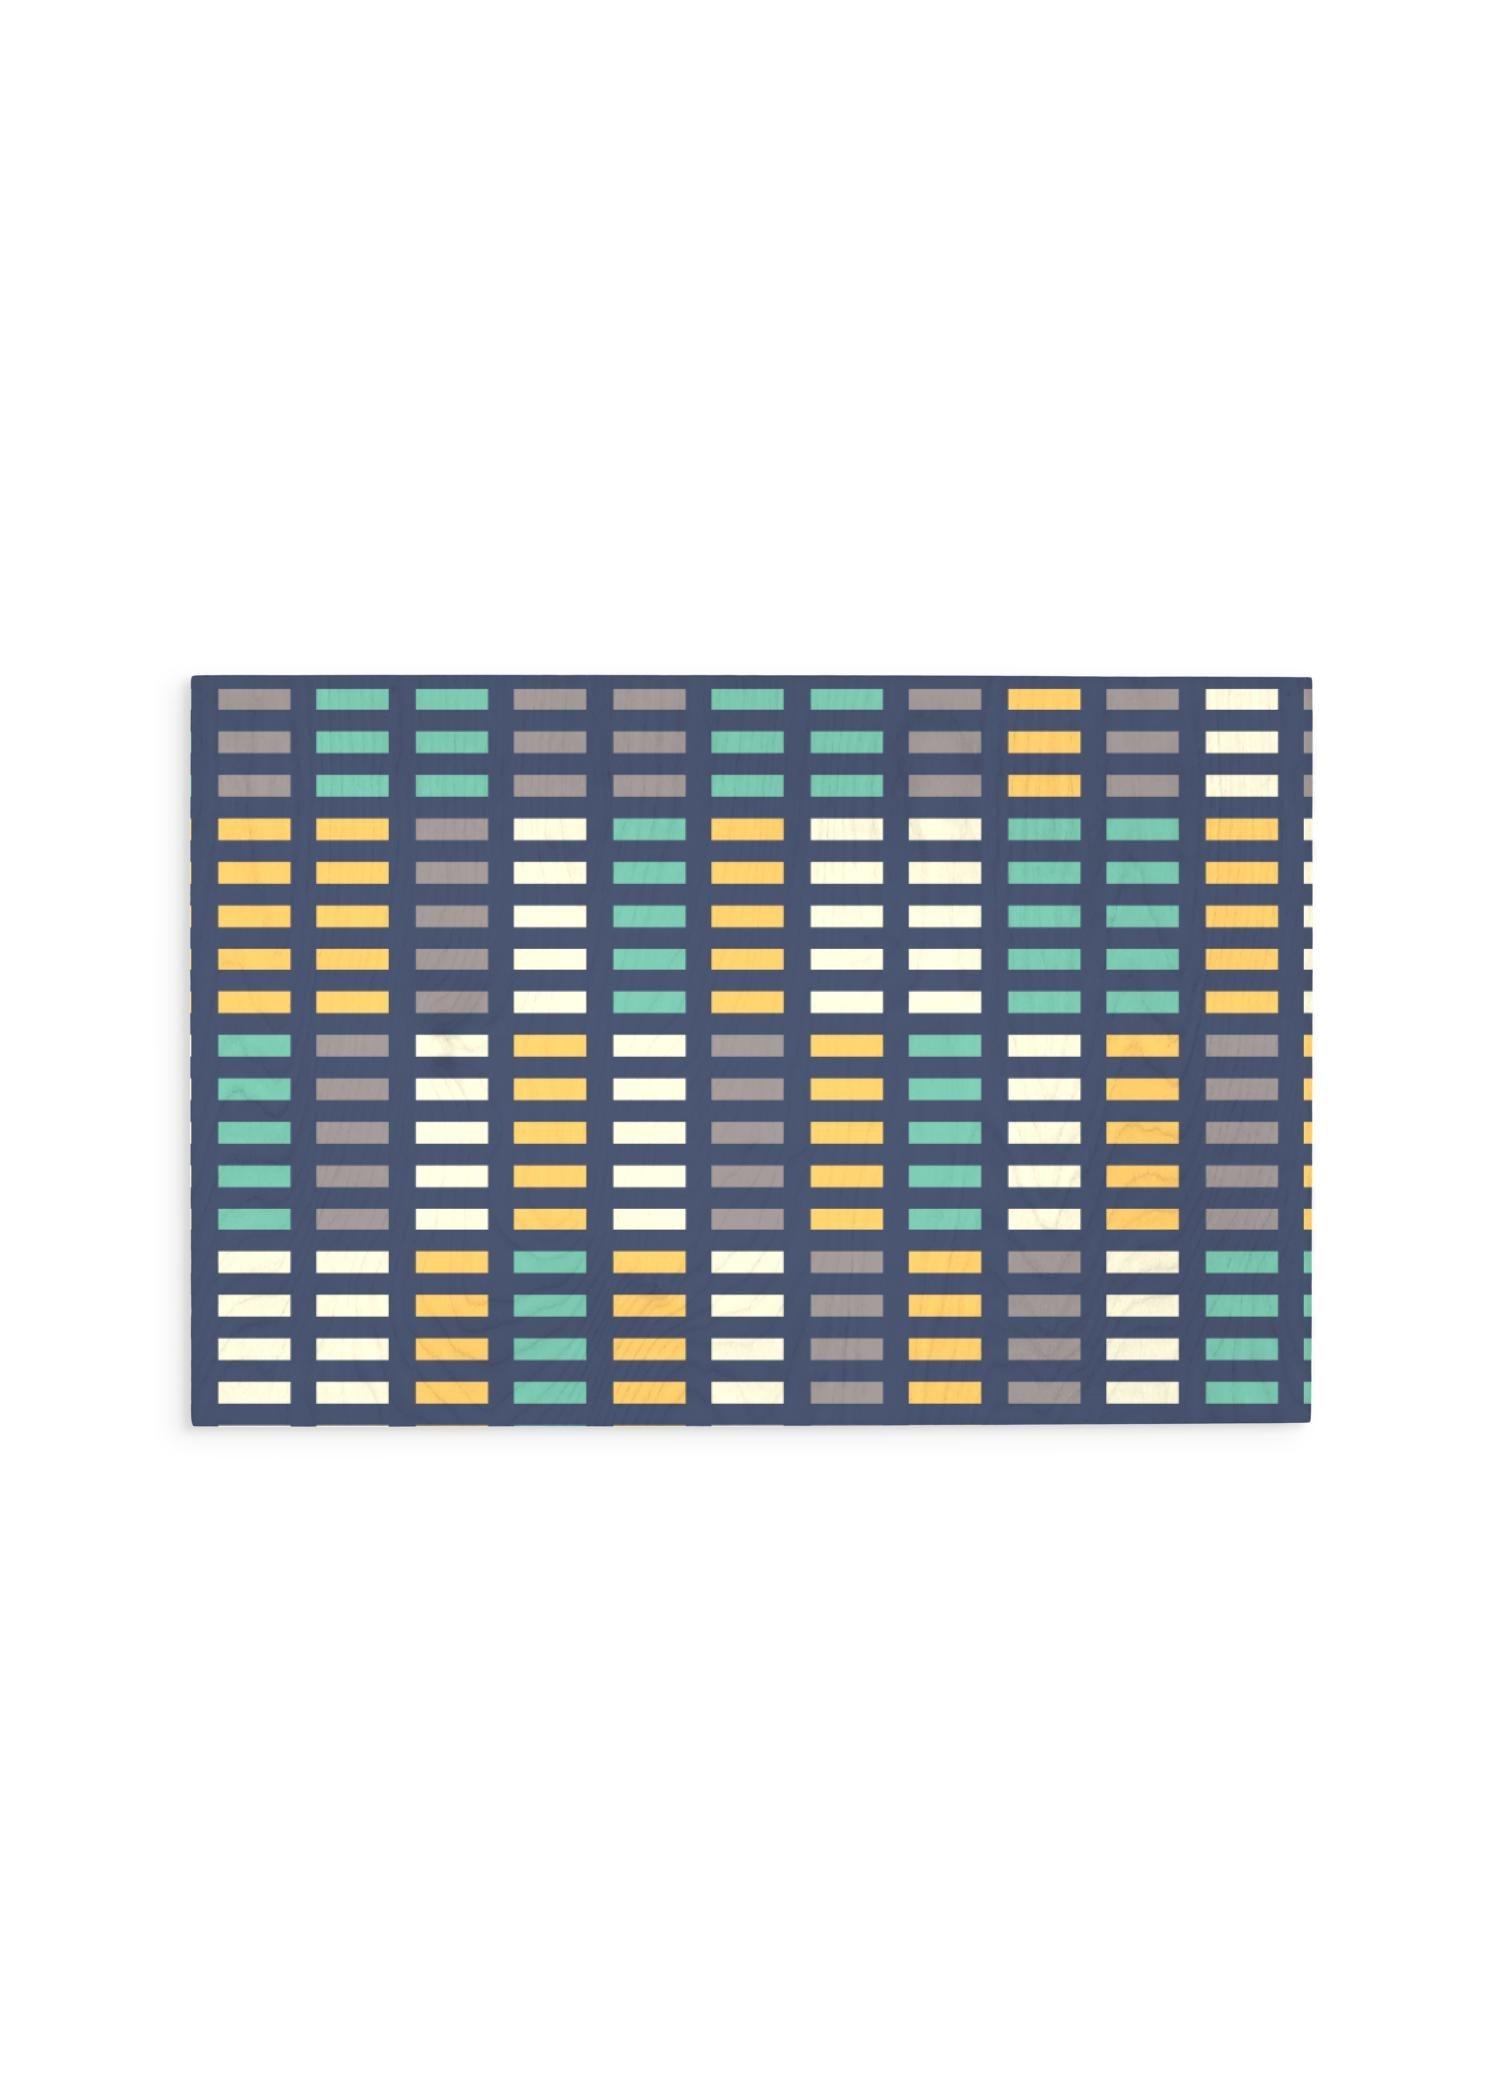 VIDA Wood Wall Art - 30x20 - Music Equalizer by VIDA Original Artist  - Size: Large